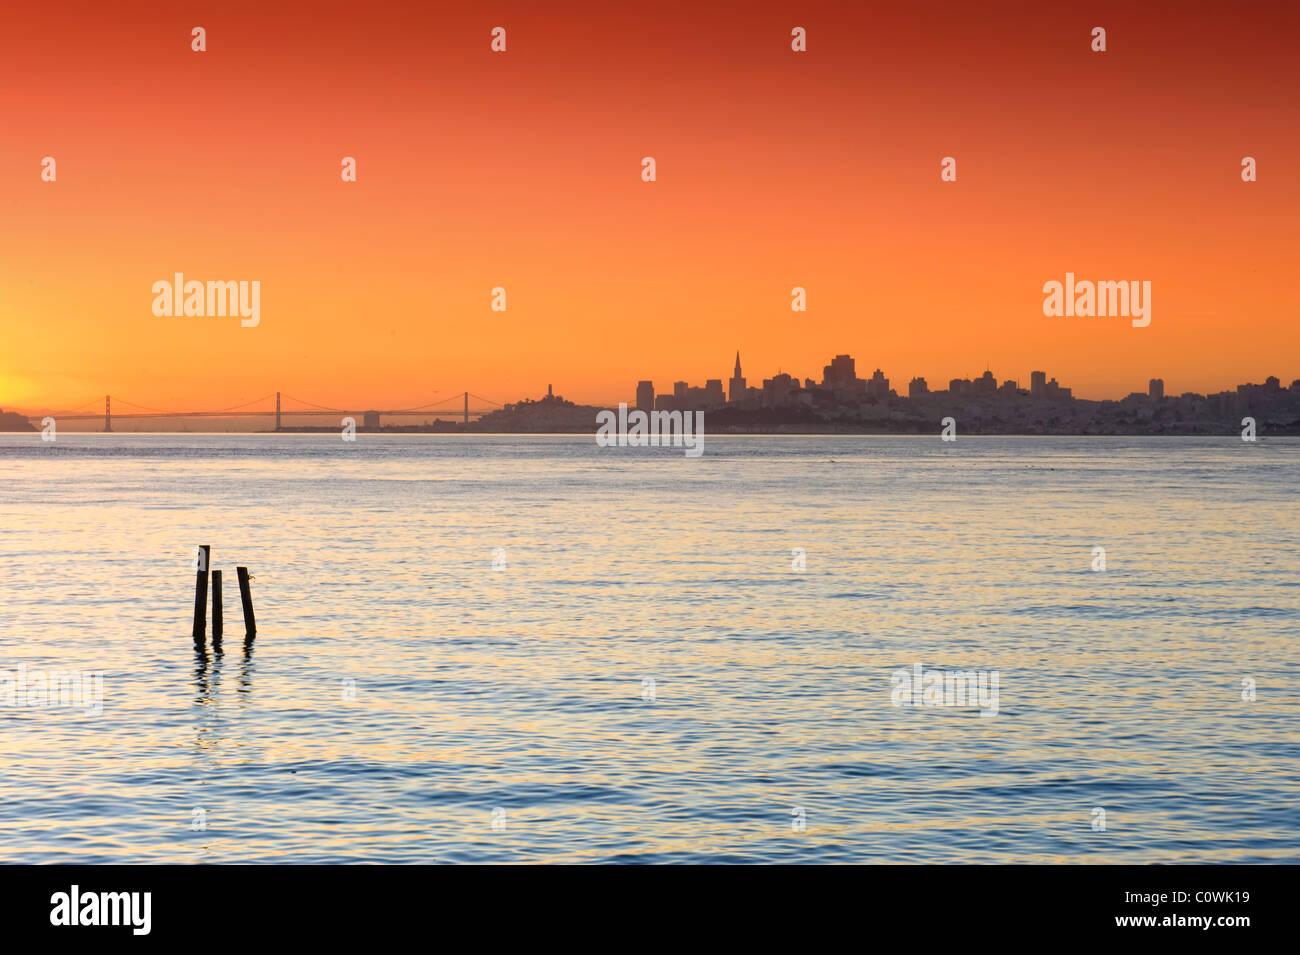 USA, Kalifornien, San Francisco, Skyline der Stadt Stockbild